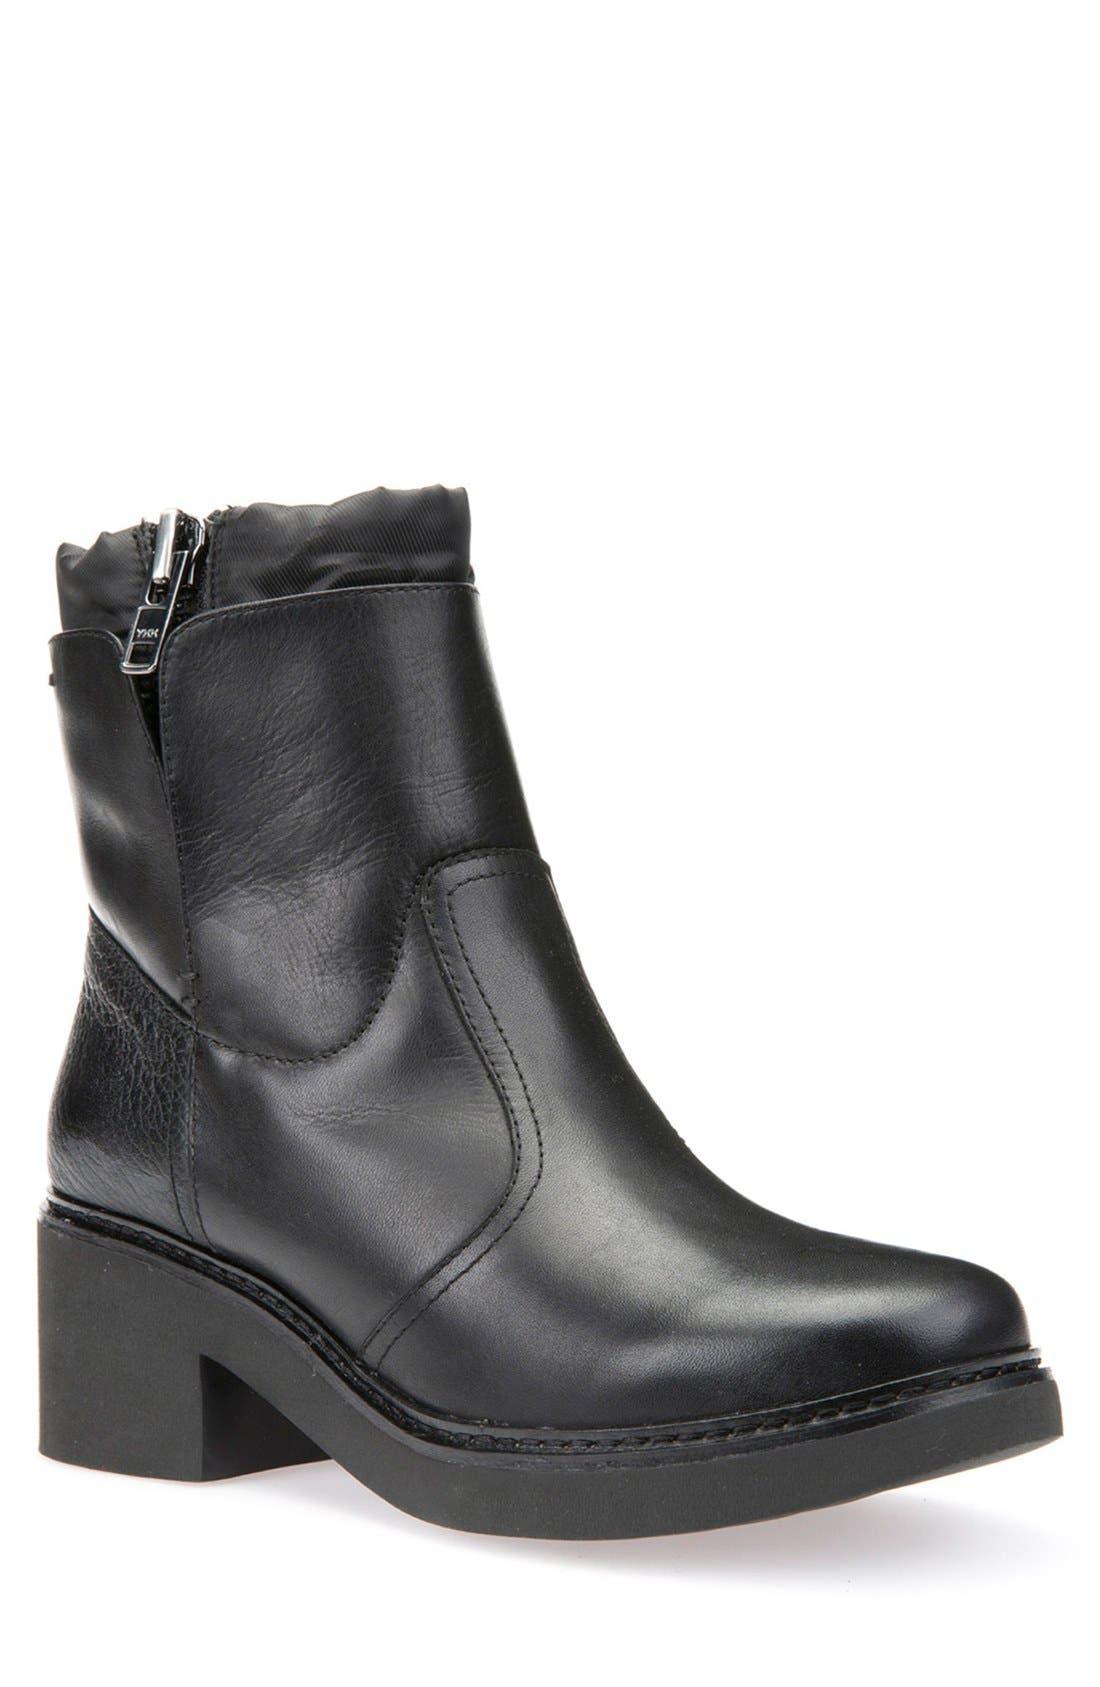 GEOX 'Aminta' Amphibiox® Waterproof Boot